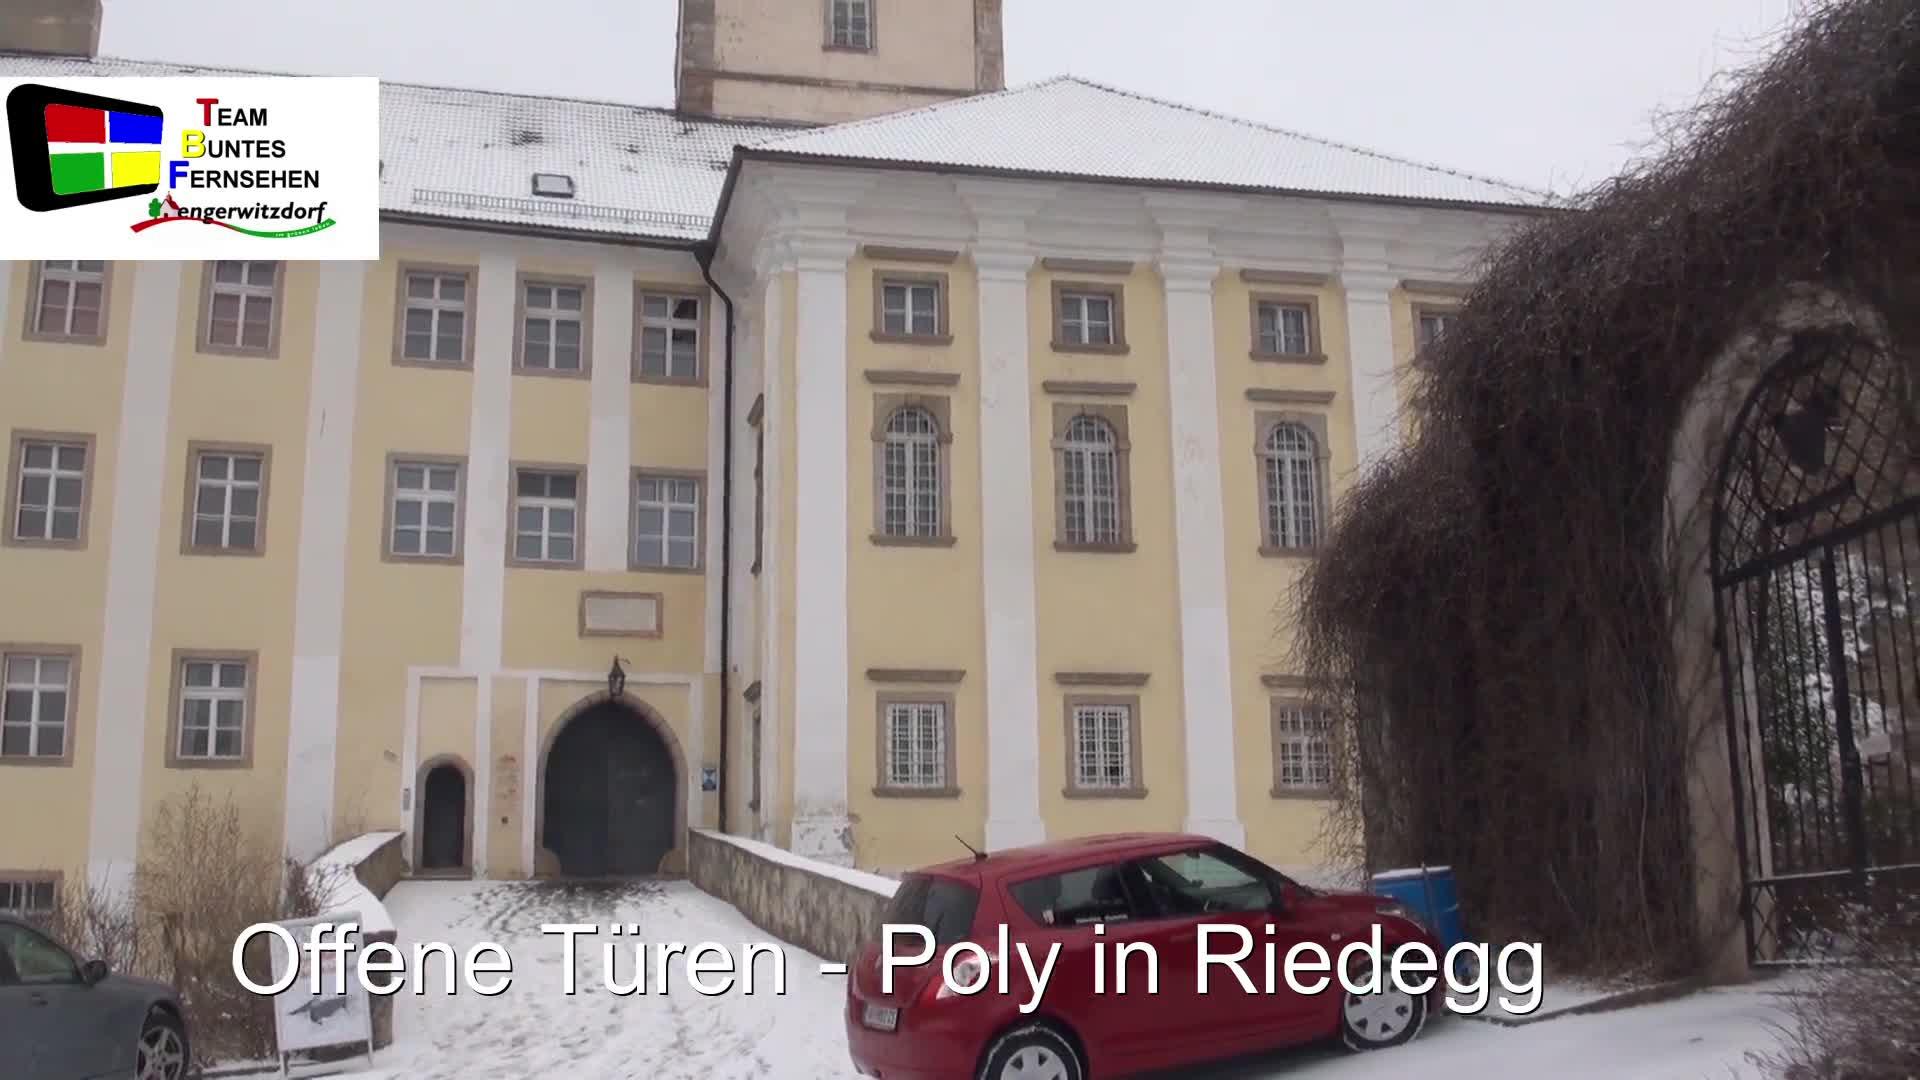 Offene Türen - Poly in Riedegg